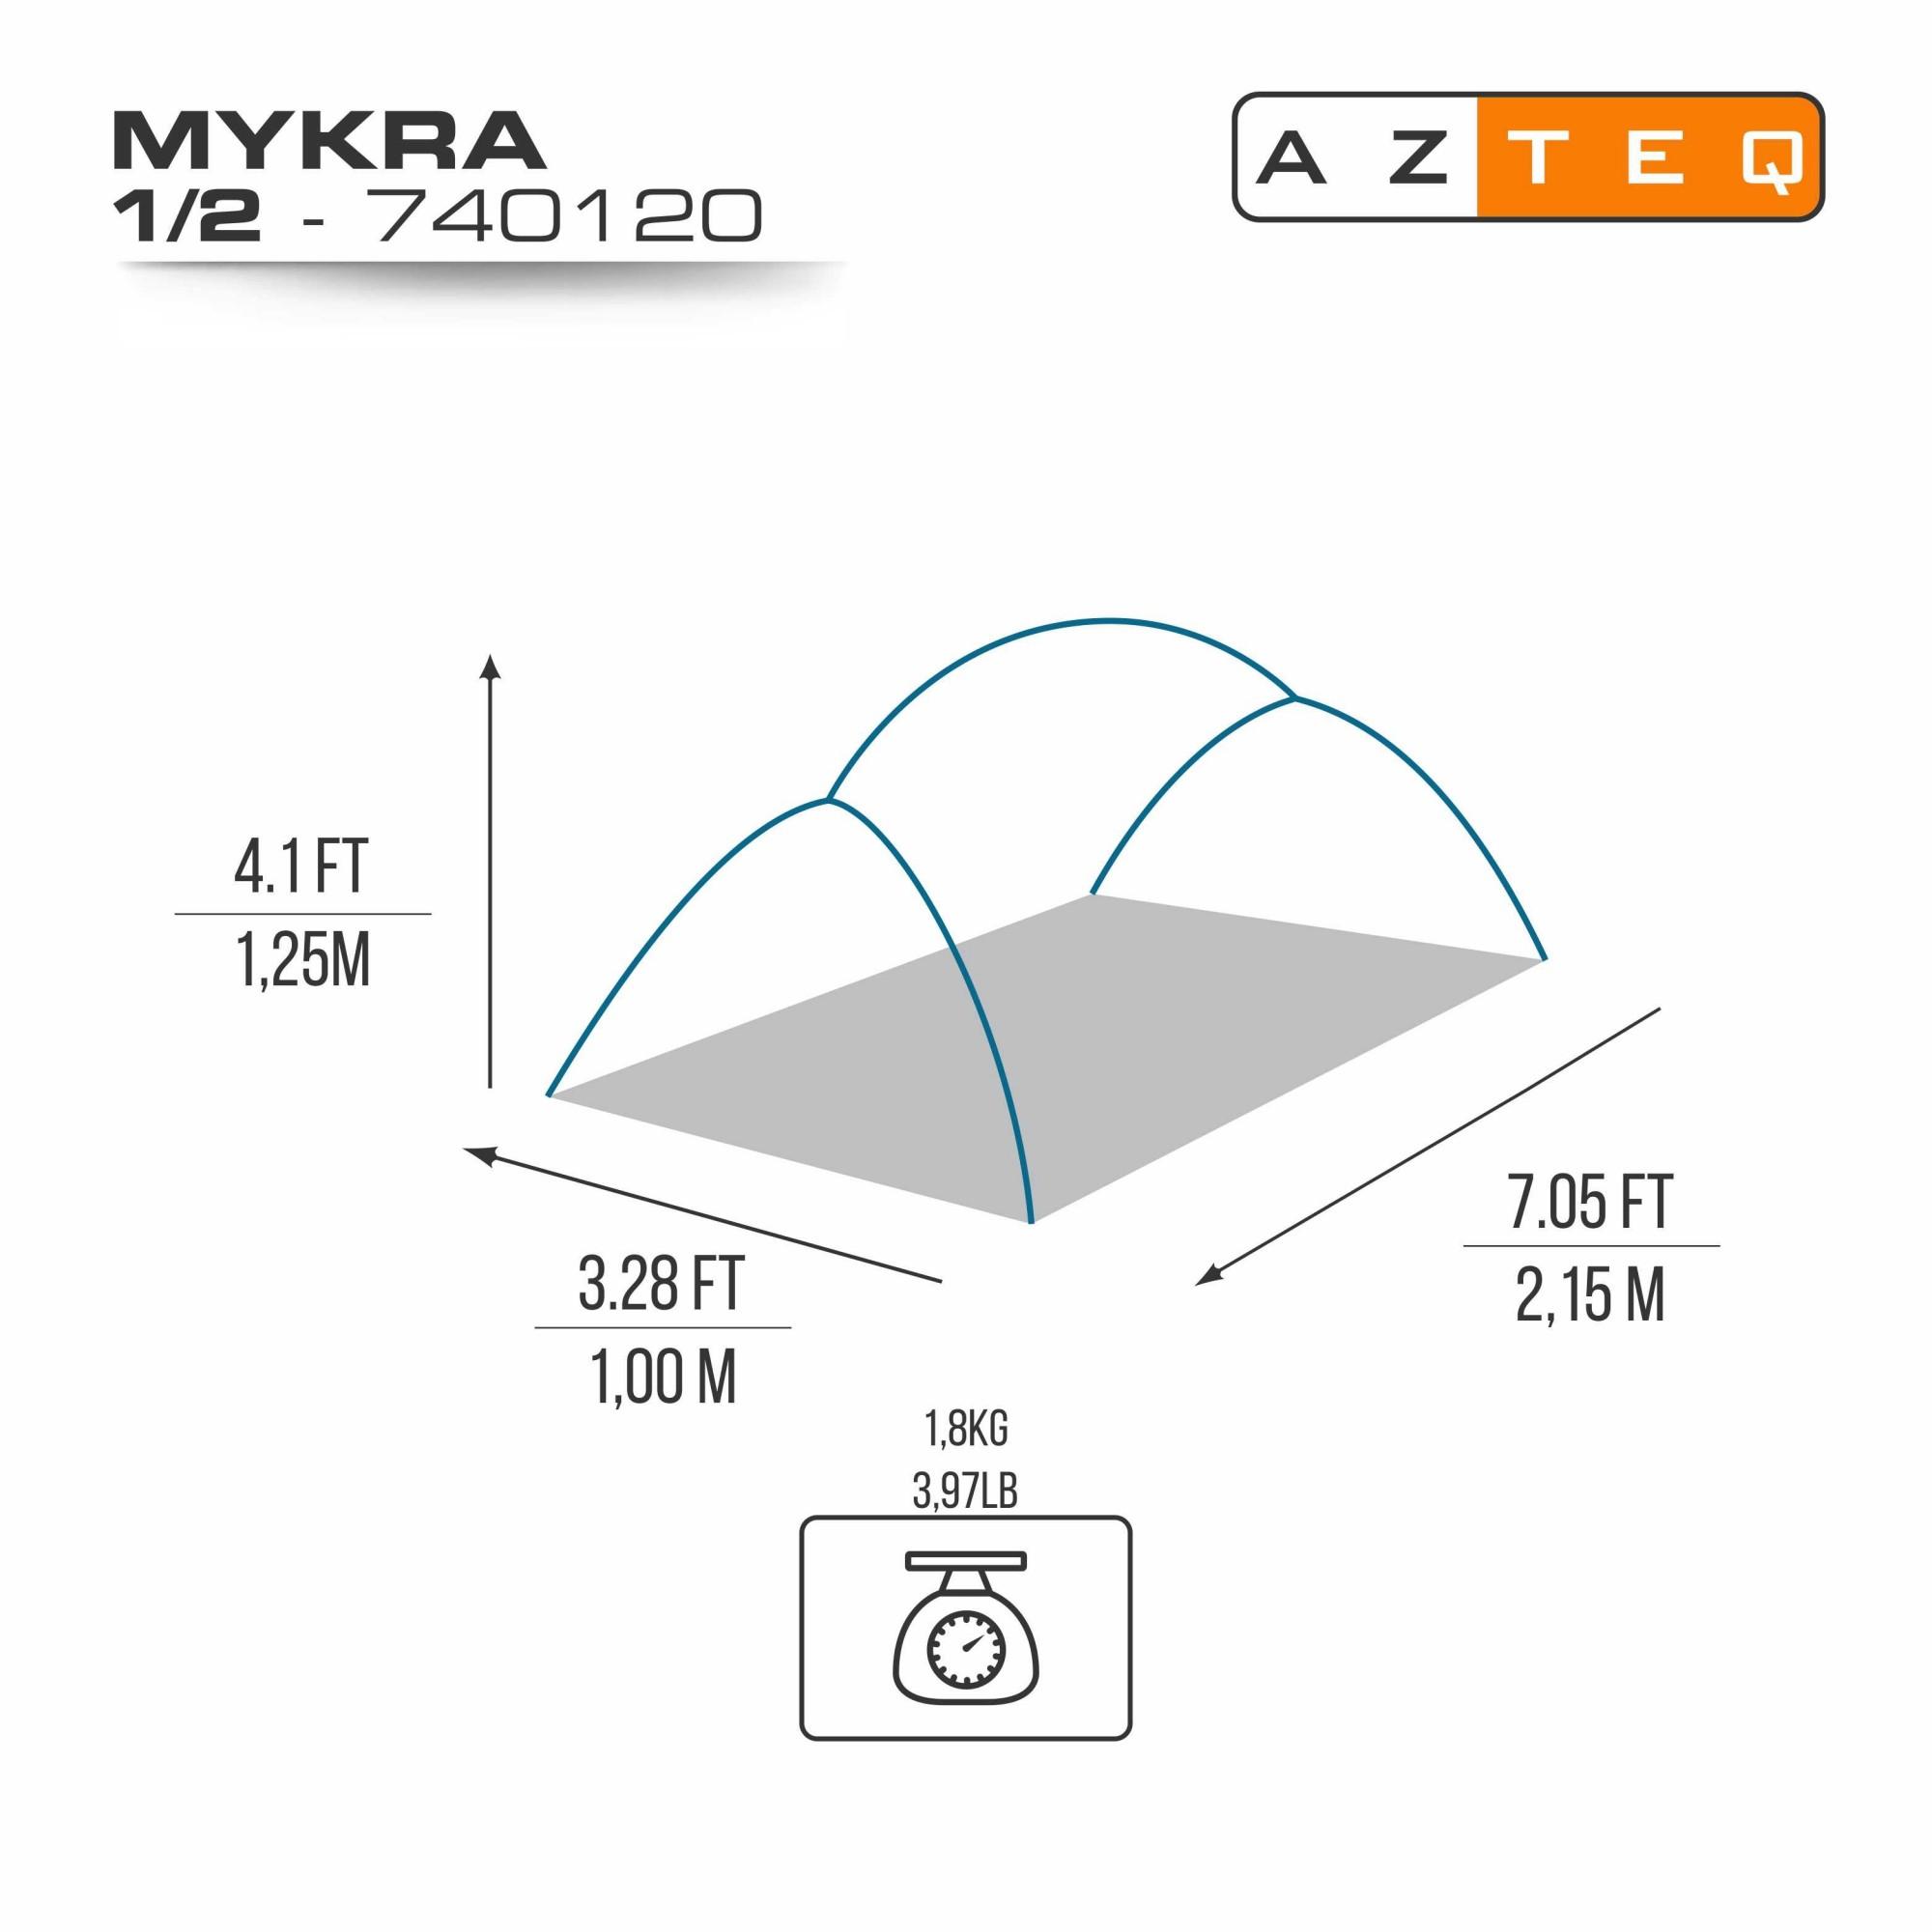 BARRACA MYKRA 1/2P UNICA